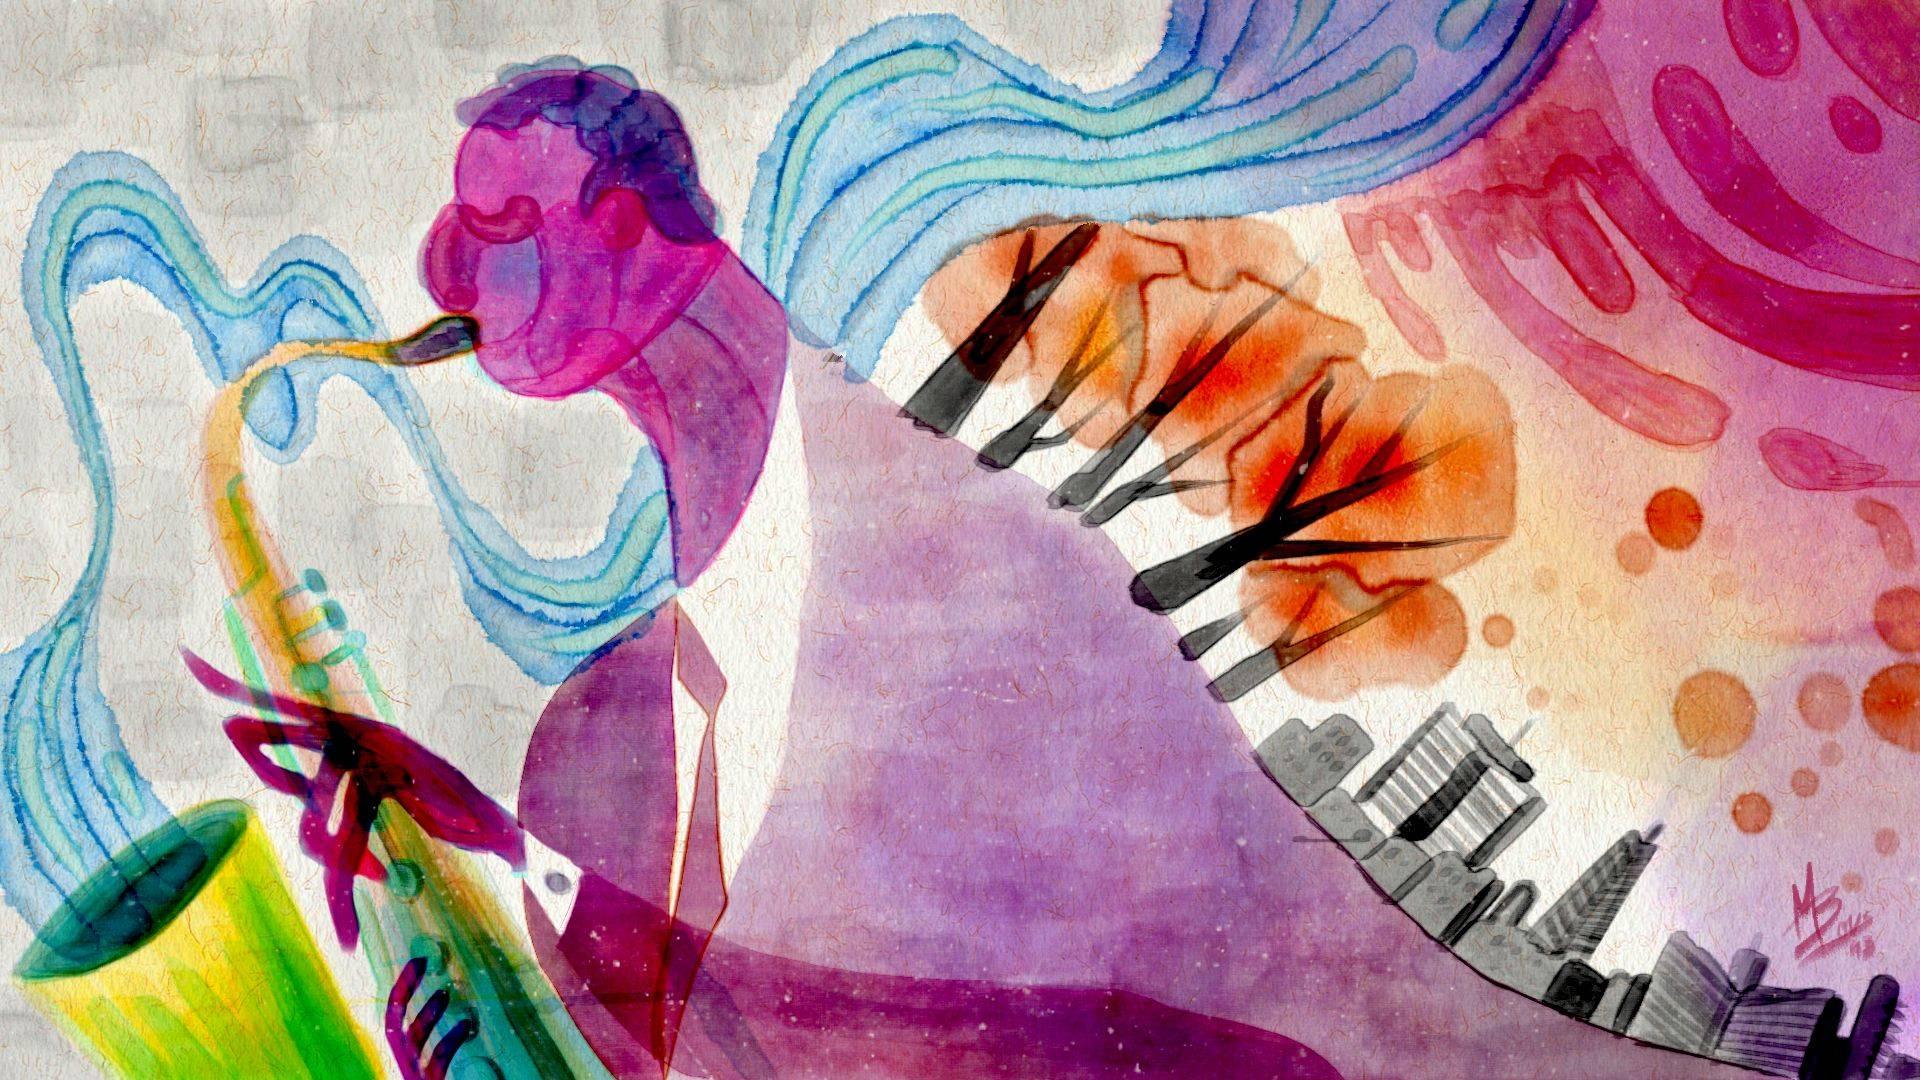 Ilustración: Mayo Bous/Magazine Am:Pm